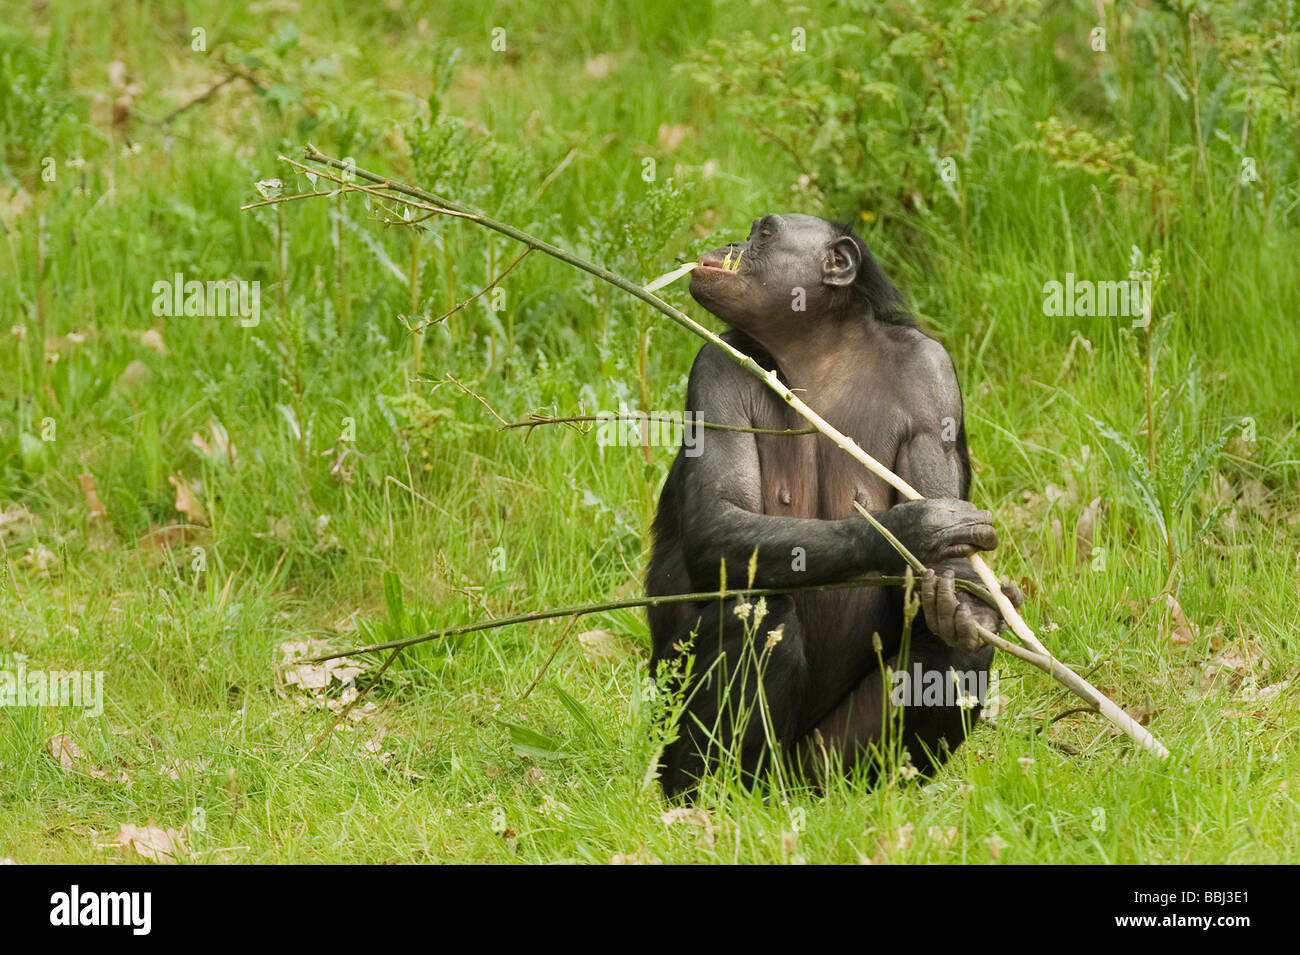 Bonobo Pan paniscus - Stock Image